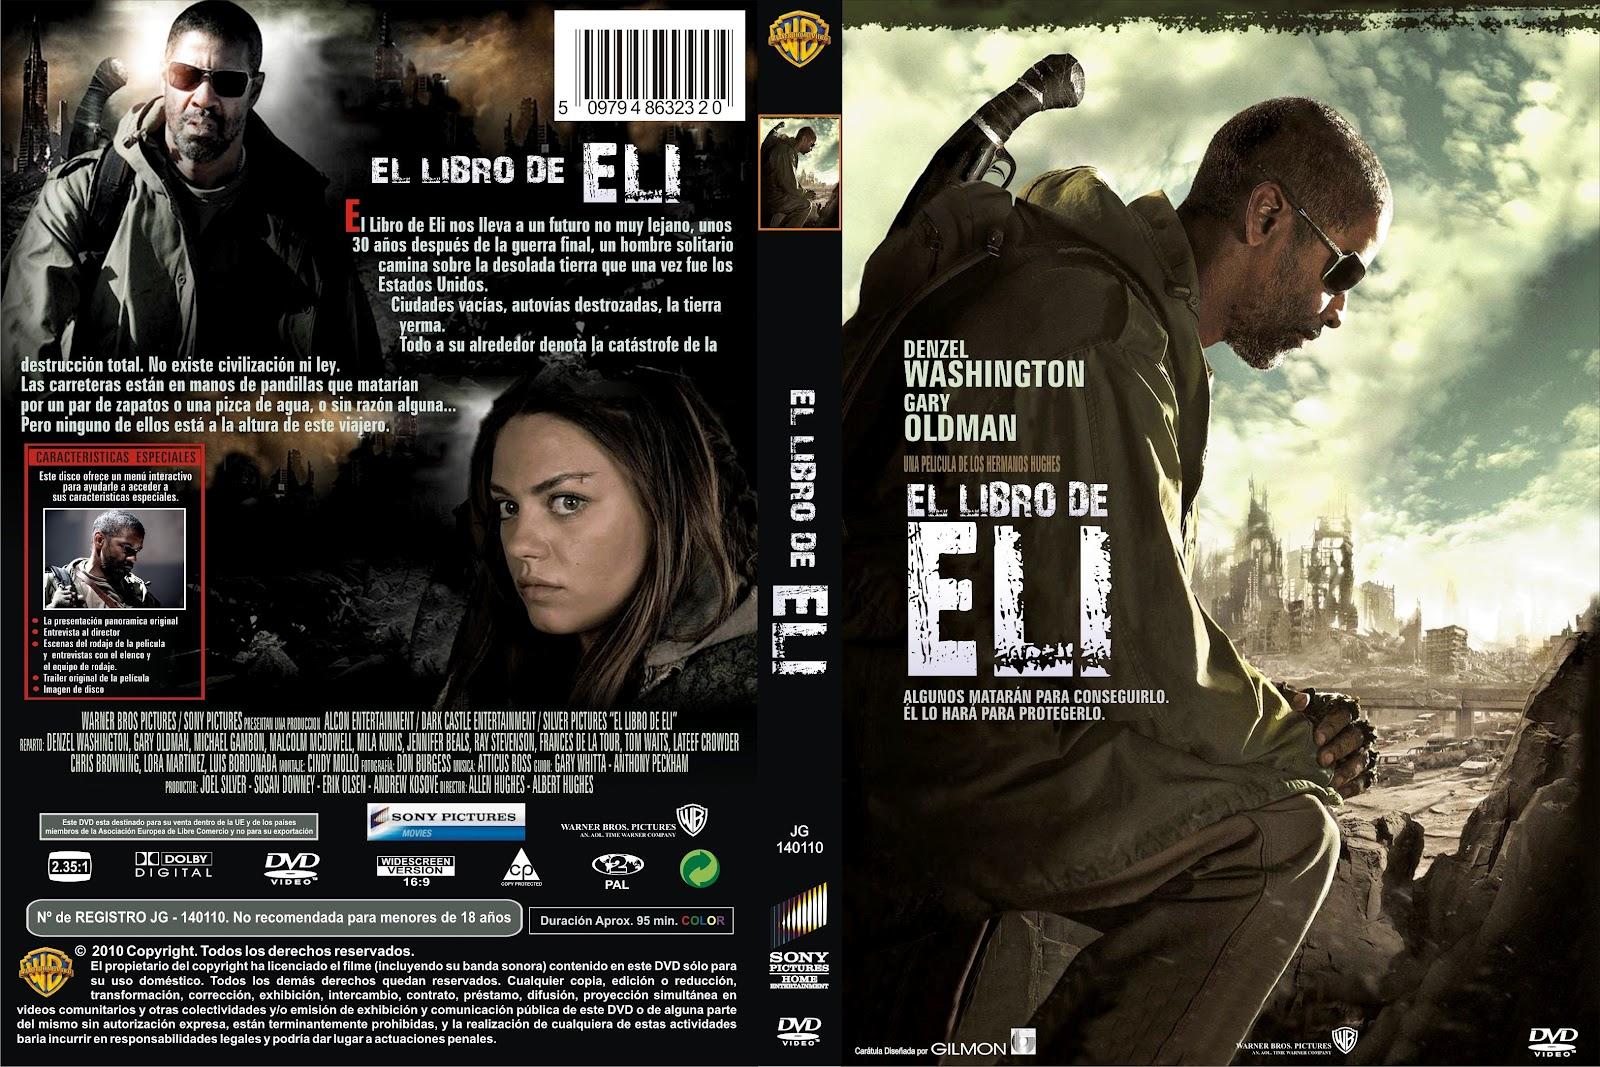 http://2.bp.blogspot.com/-Np2pz2P7DoE/T0Rx4_MwnTI/AAAAAAAAAos/Q1Q24KLtgoY/s1600/El+Libro+De+Eli+Custom+V2+Por+Jhongilmon+-+dvd.jpg